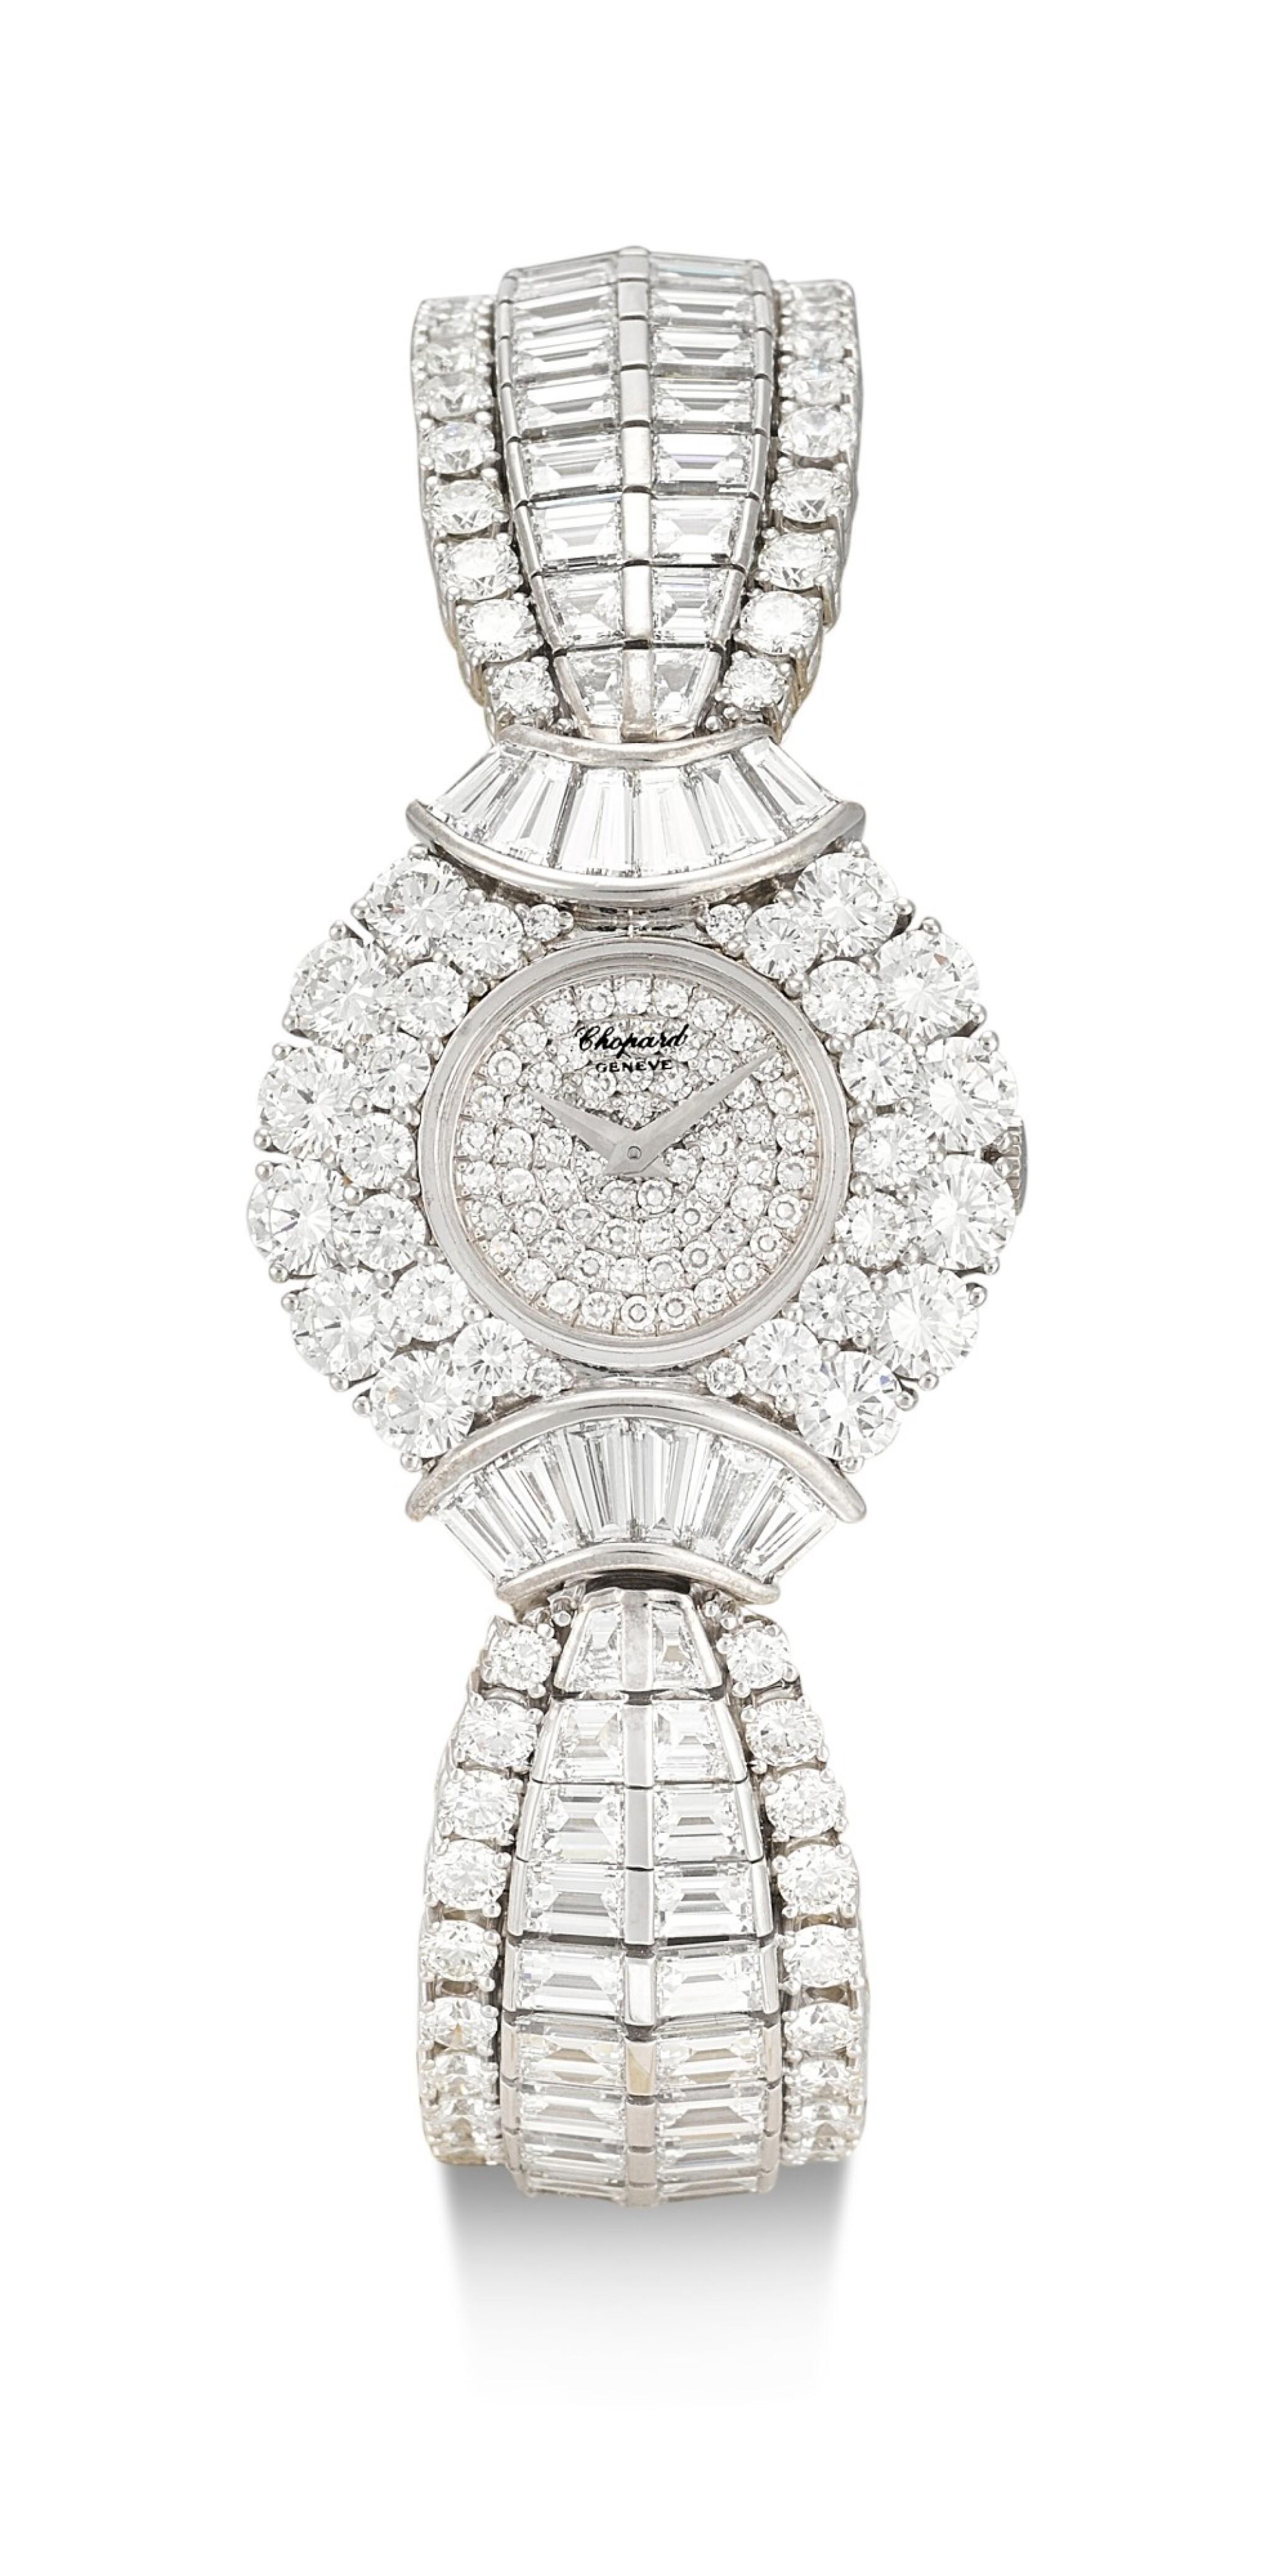 View full screen - View 1 of Lot 1020. RARE AND POSSIBLY UNIQUE MANUALLY-WOUND DIAMOND WRISTWATCH, CHOPARD 罕有並可能獨一無二手動上鏈鑽石腕錶, 蕭邦 (Chopard) .